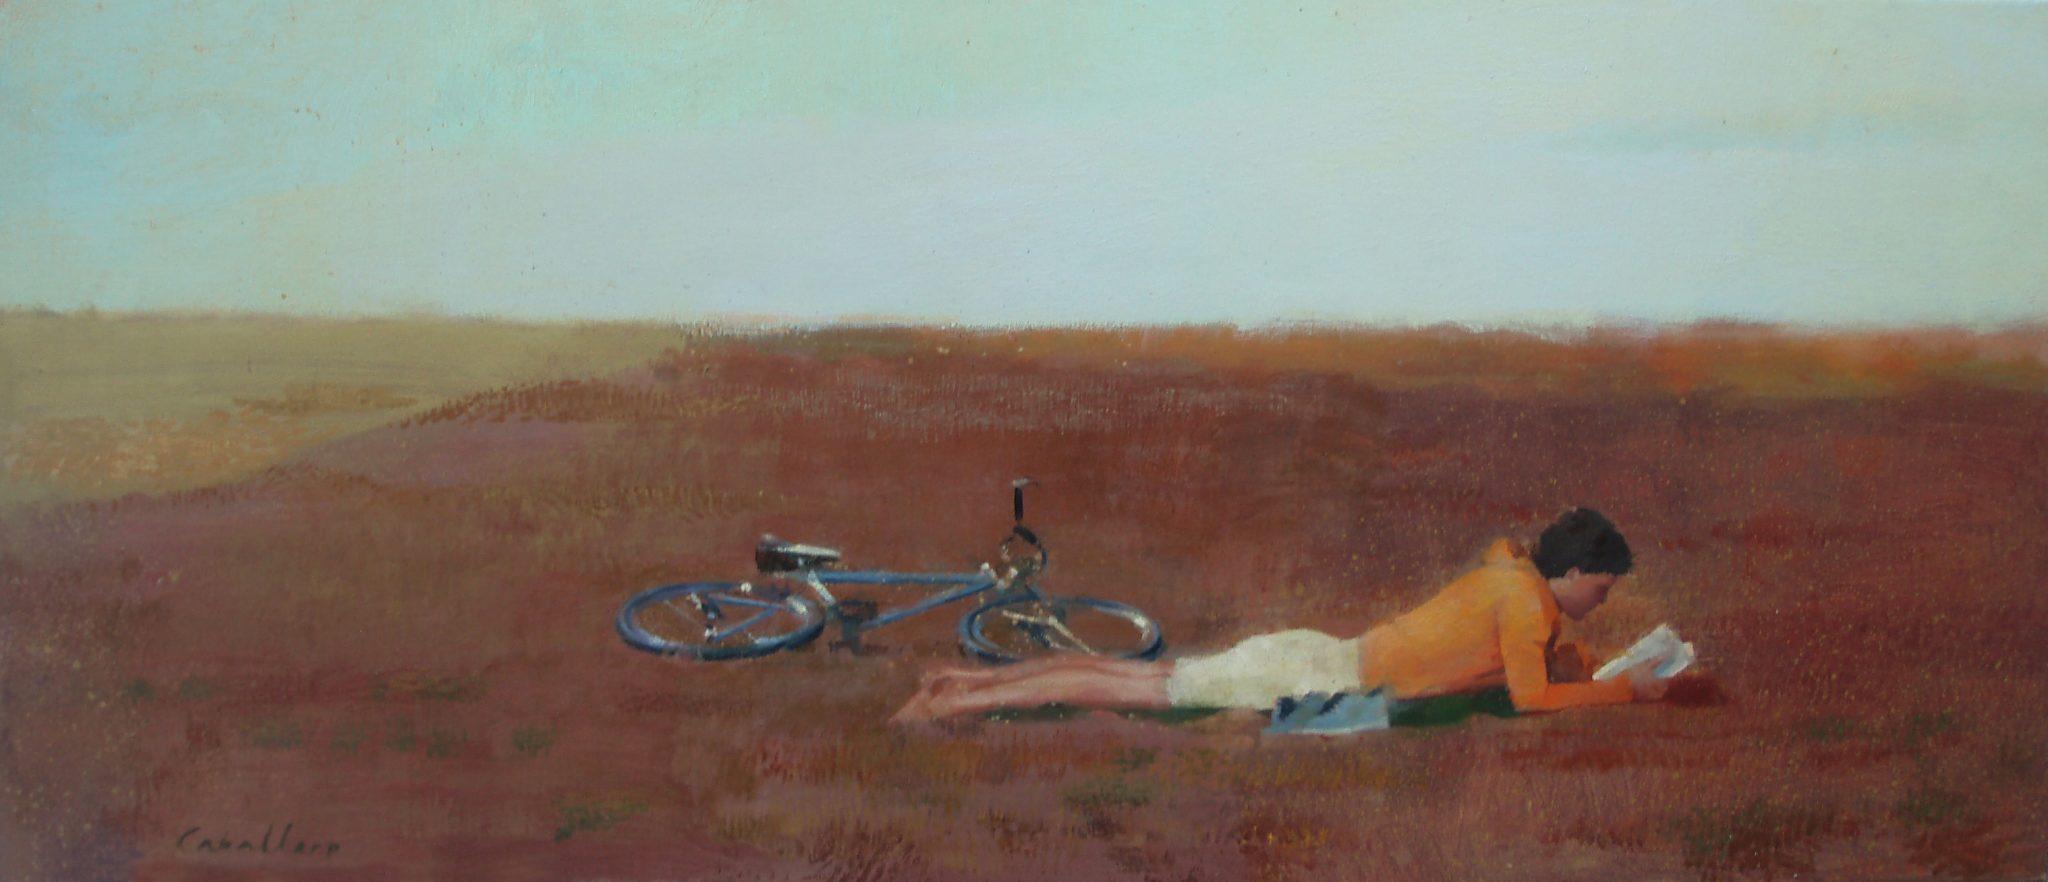 versos-alejandra-caballero-oleo-hombre-tumbado-boca-abajo-leyendo-bicicleta-paisaje